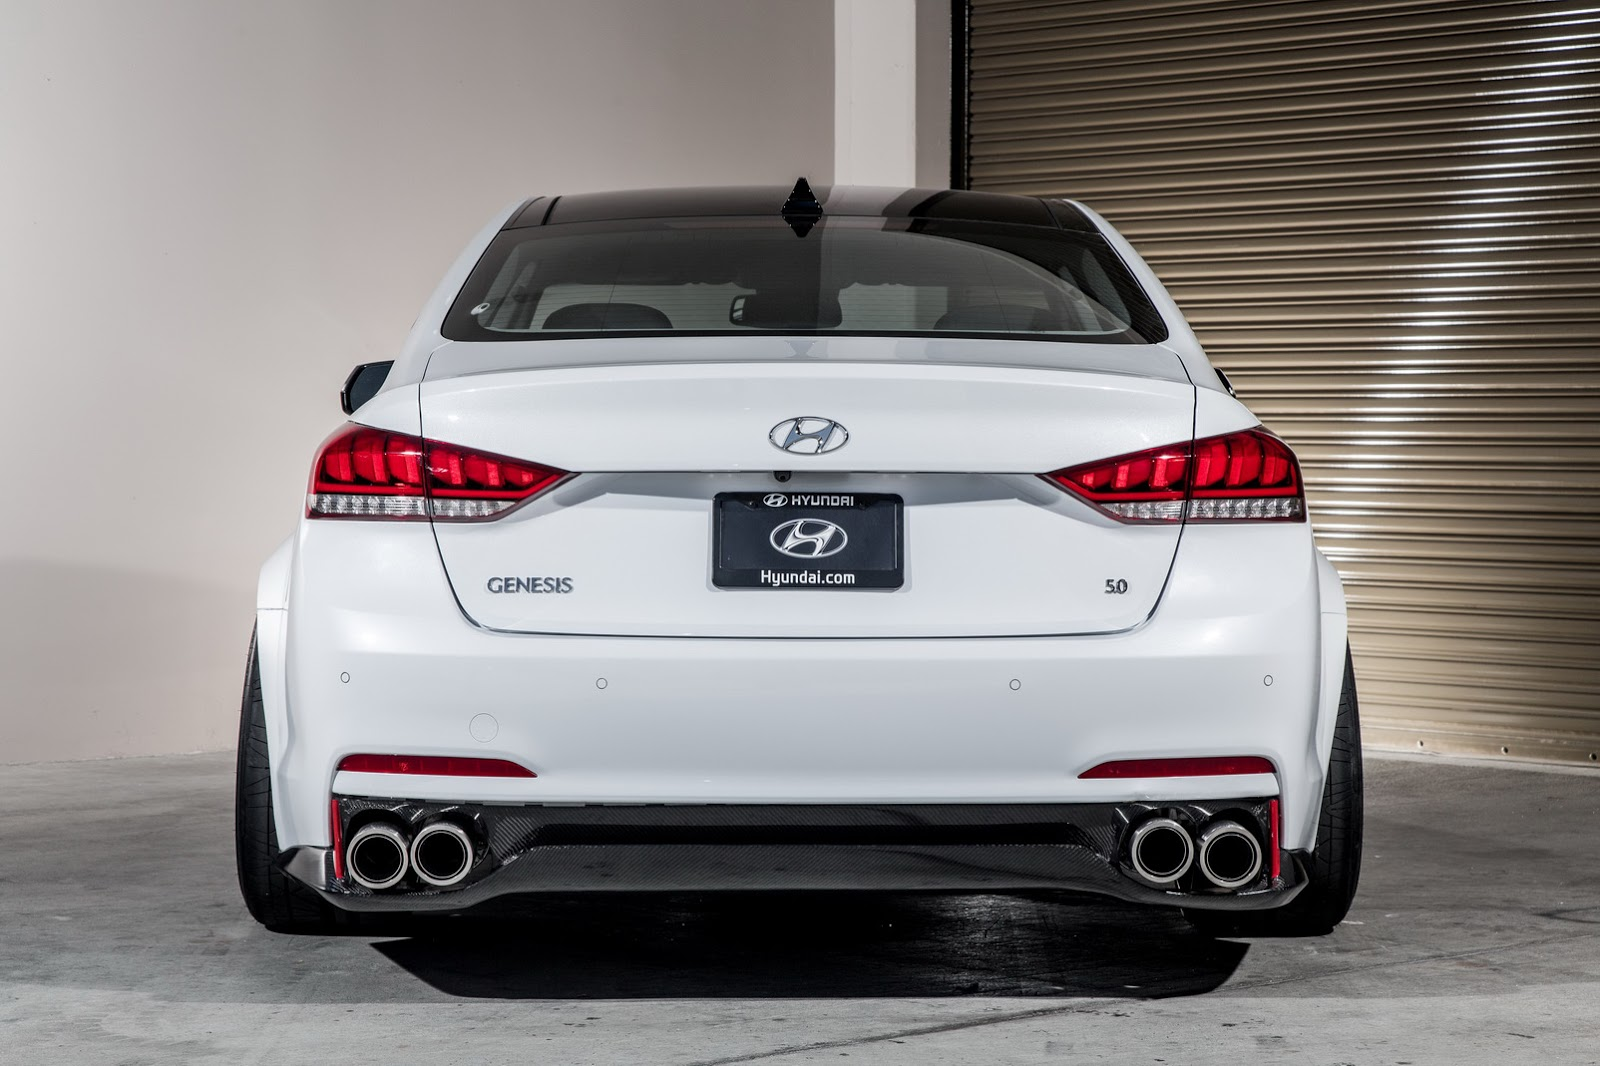 Hyundai-Genesis-ARK-7